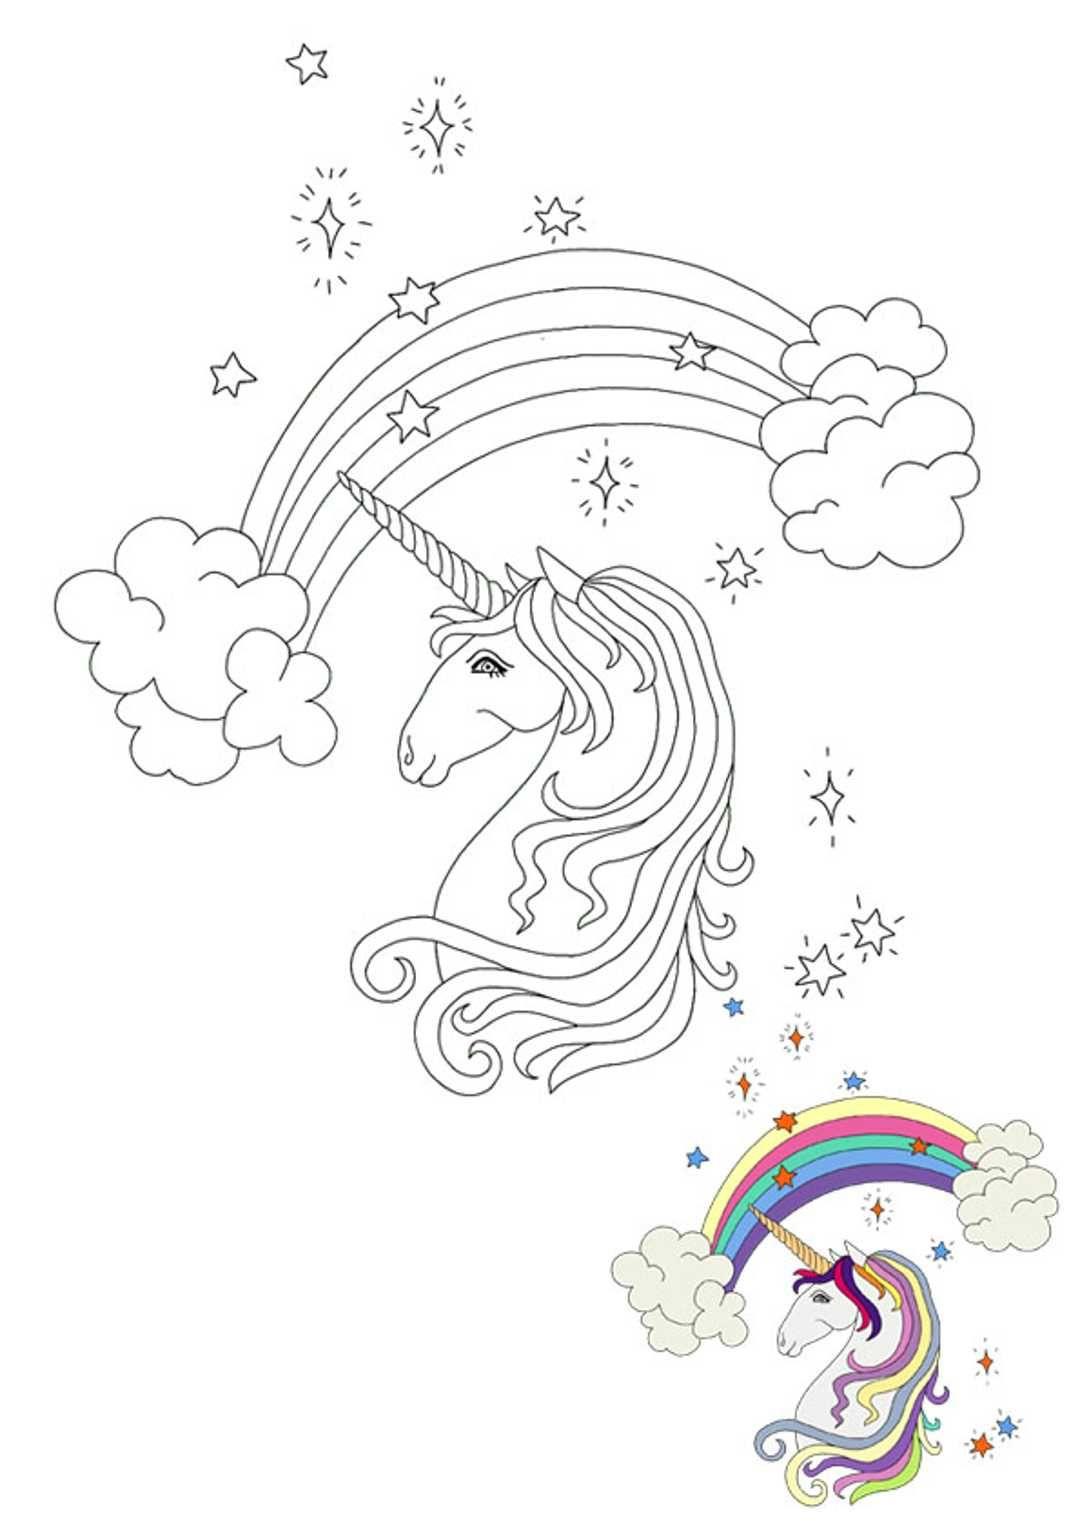 Unicorn Head Coloring Page Unicorn Coloring Pages Mermaid Coloring Pages Coloring Pages